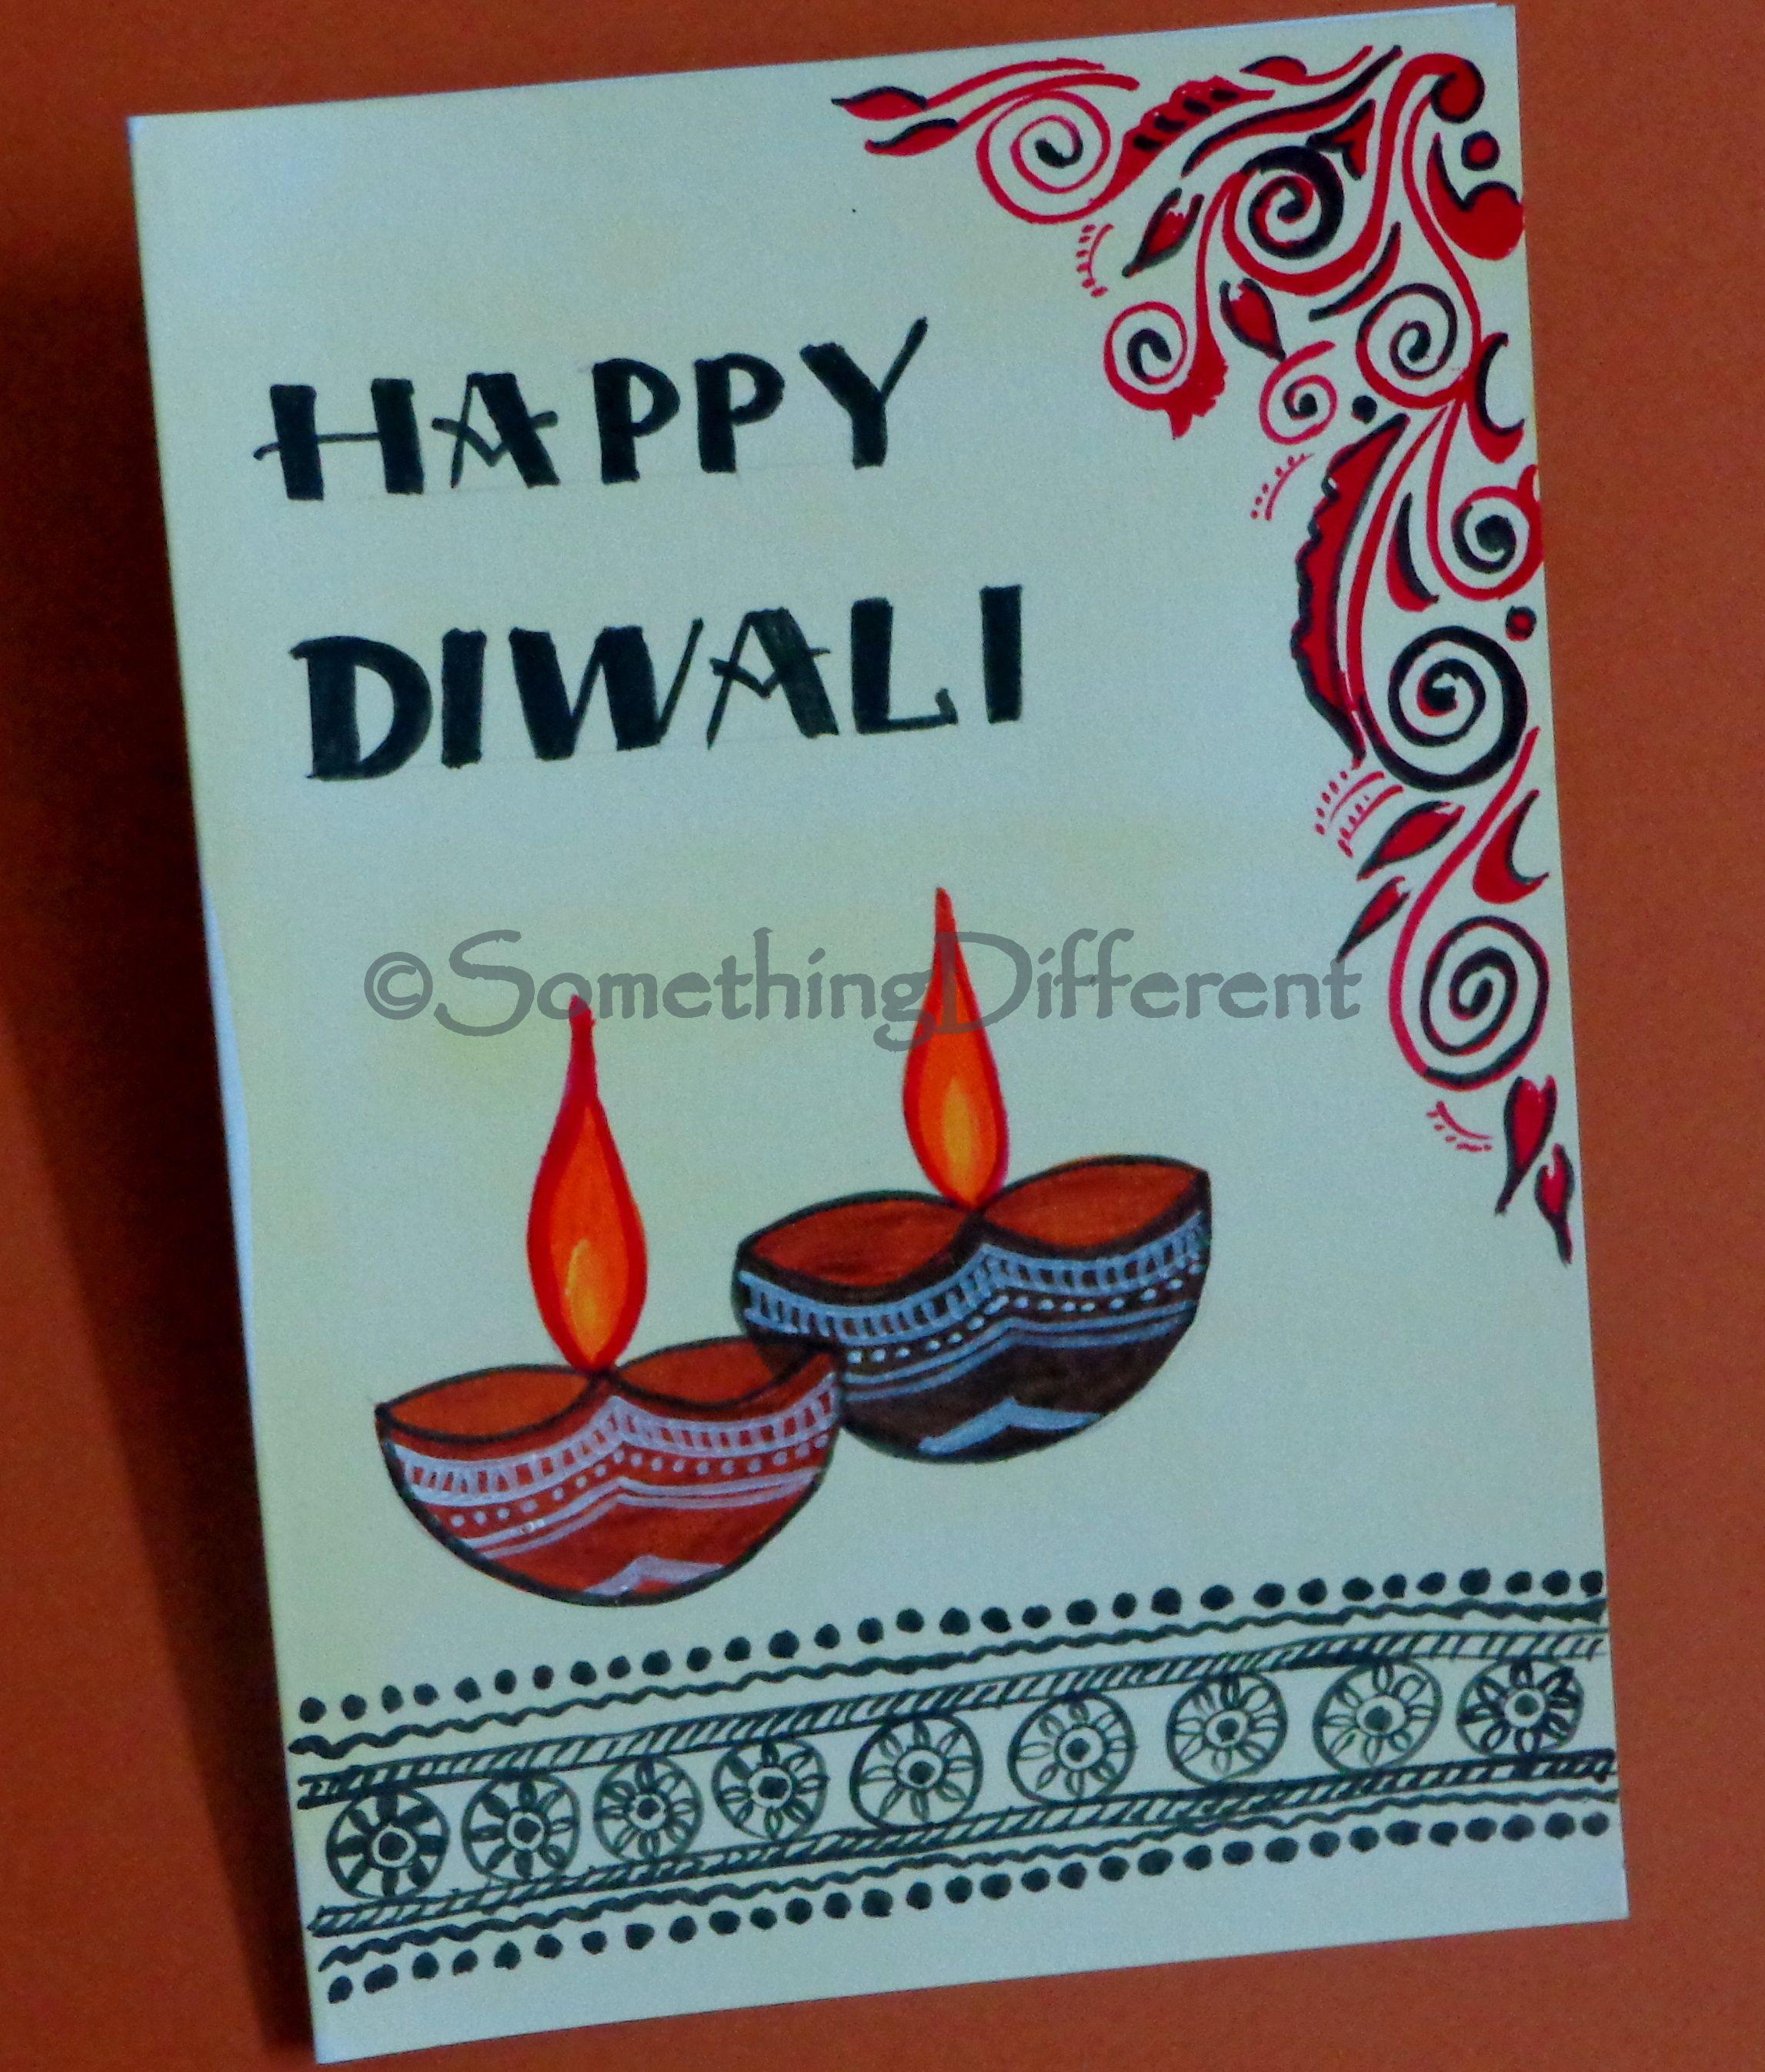 Diwali Greeting Card Handmade Diwali Greeting Cards Diwali Greeting Cards Diwali Cards